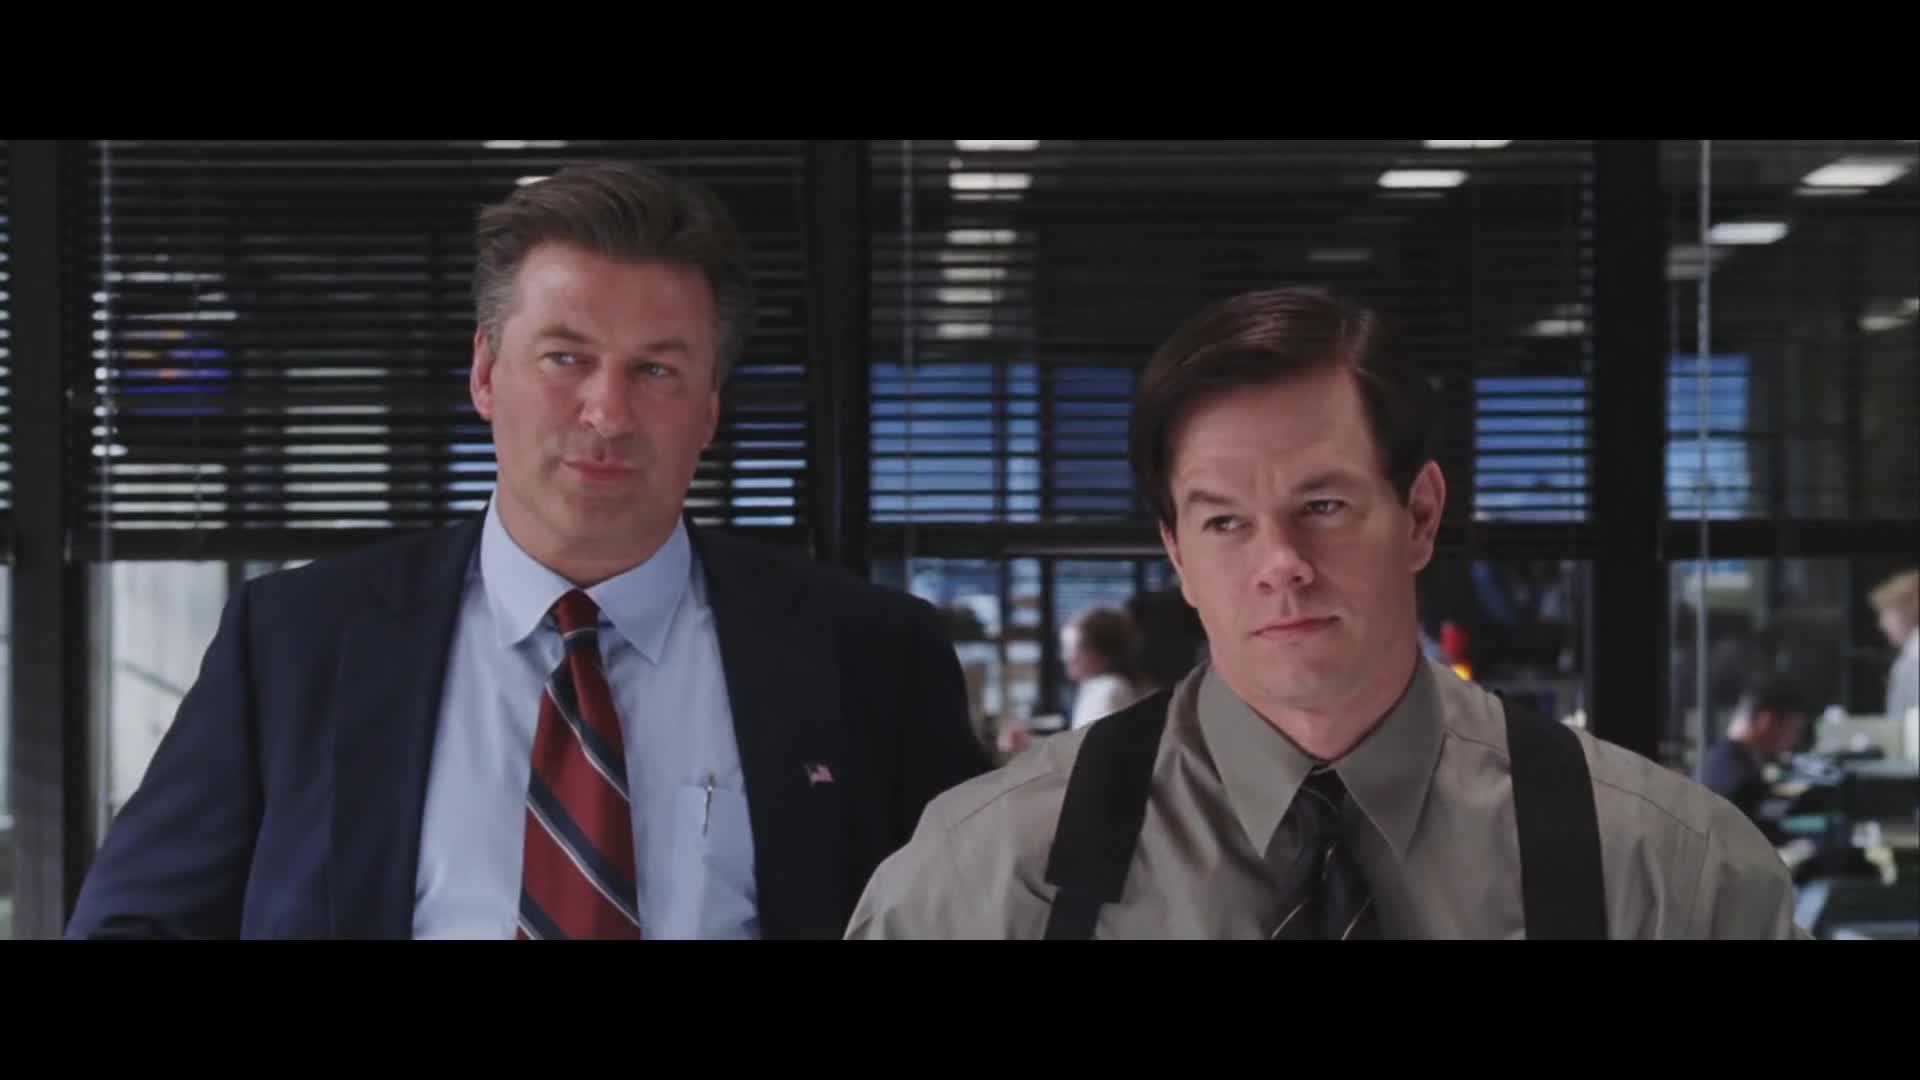 Alec Baldwin, Dignam, Leonardo DiCaprio, Mark Wahlberg, Martin Sheen, Matt Damon, The Departed, fuckyourself, maybemaybenot, The Departed - Maybe. Maybe not. Maybe fuck yourself. GIFs